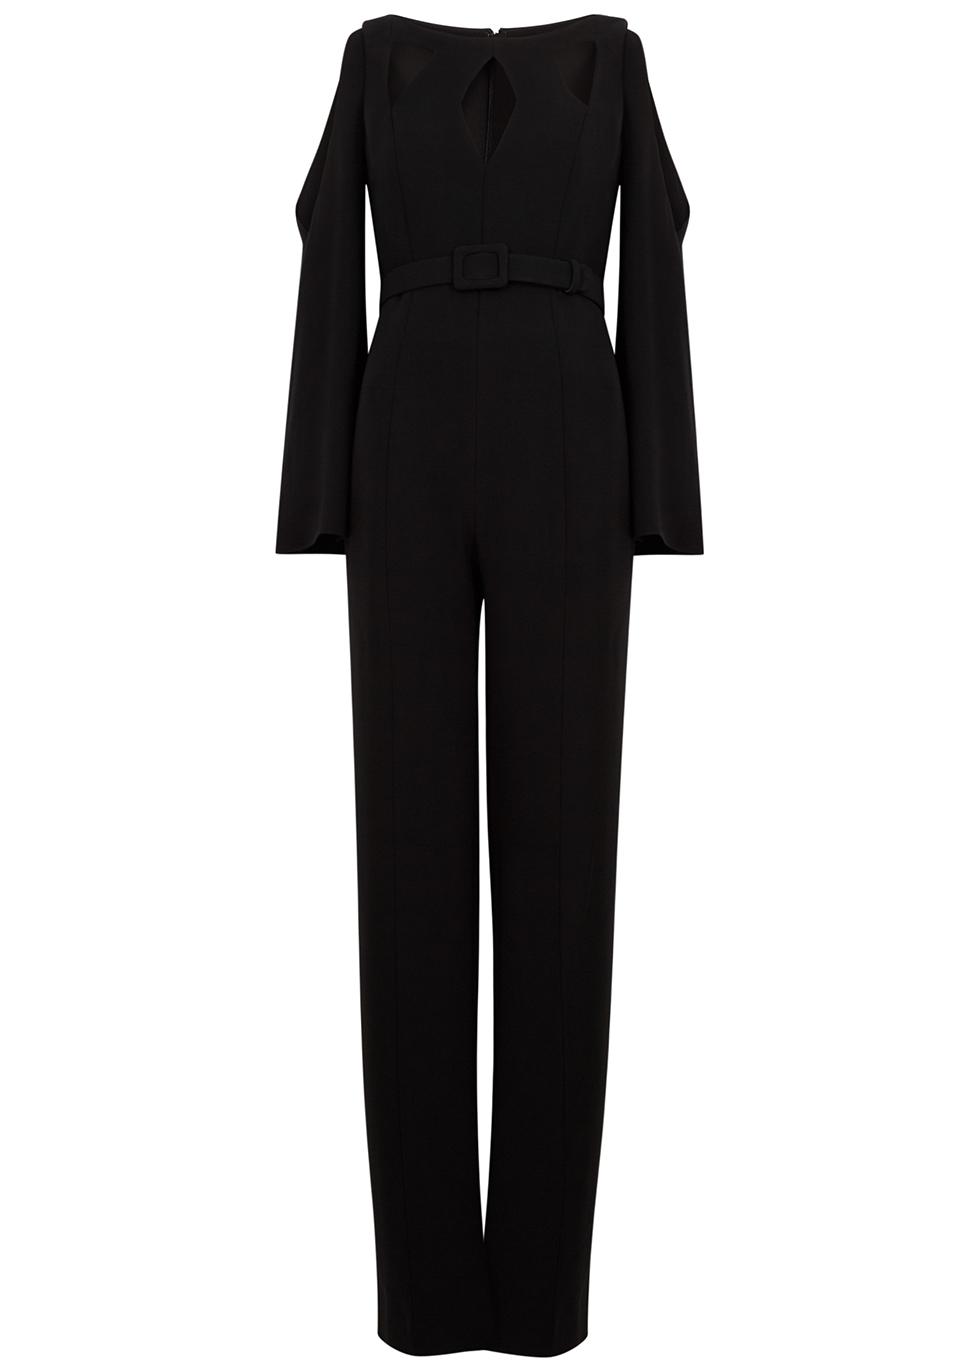 Black belted cut-out jumpsuit